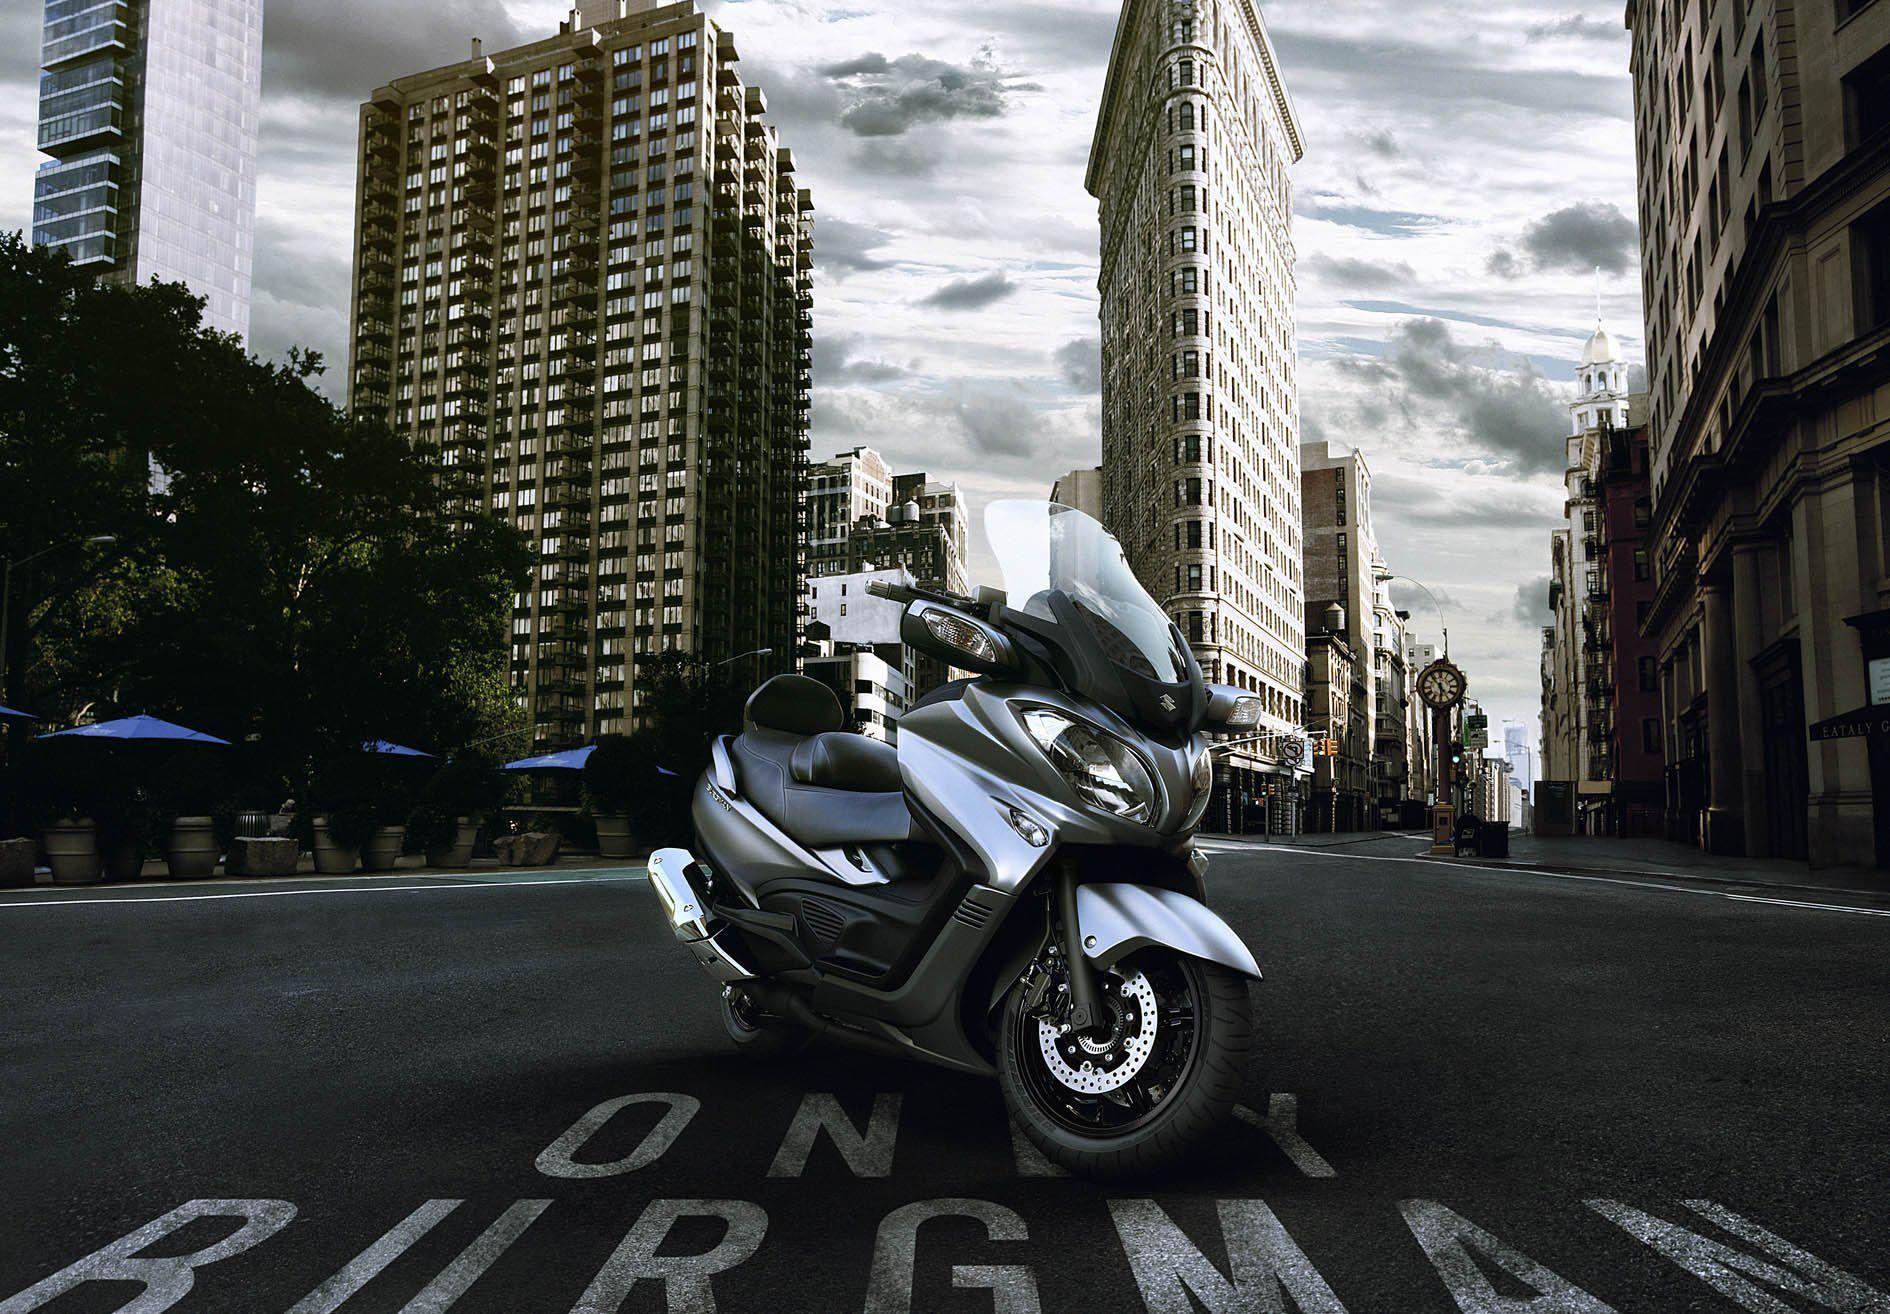 2021 Honda Fcev Speed Test in 2020 Fcev, Speed test, Honda